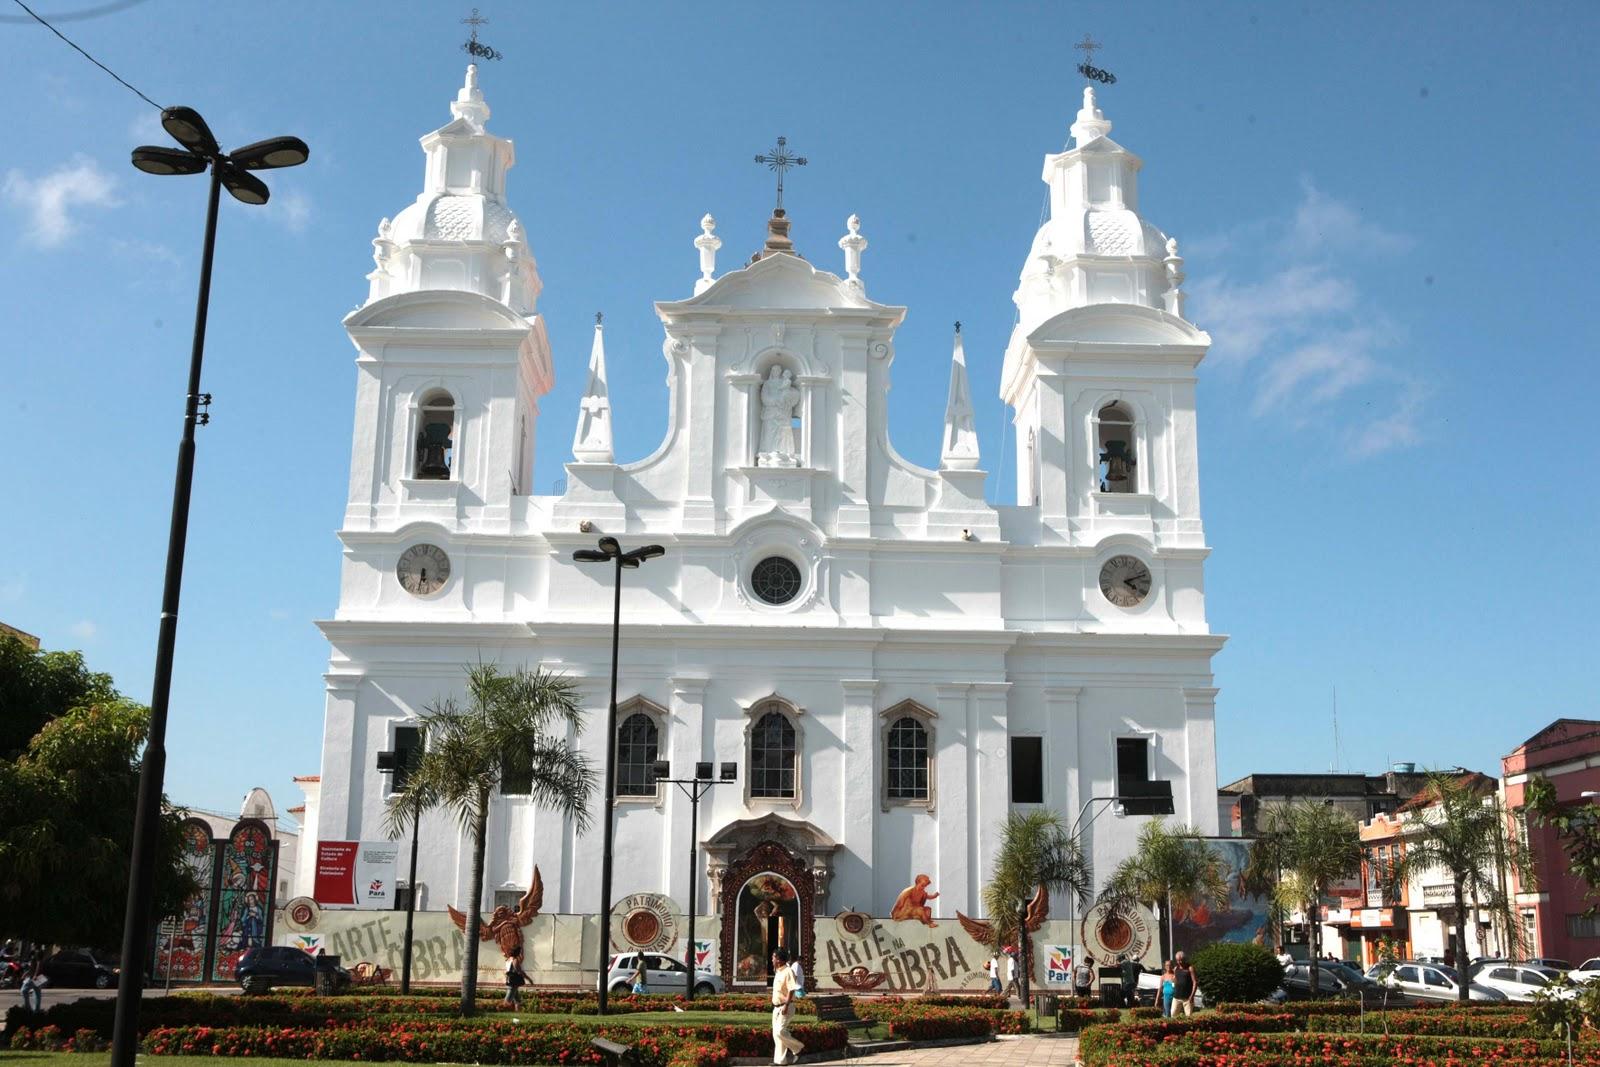 Igreja da Sé - Catedral de Belém